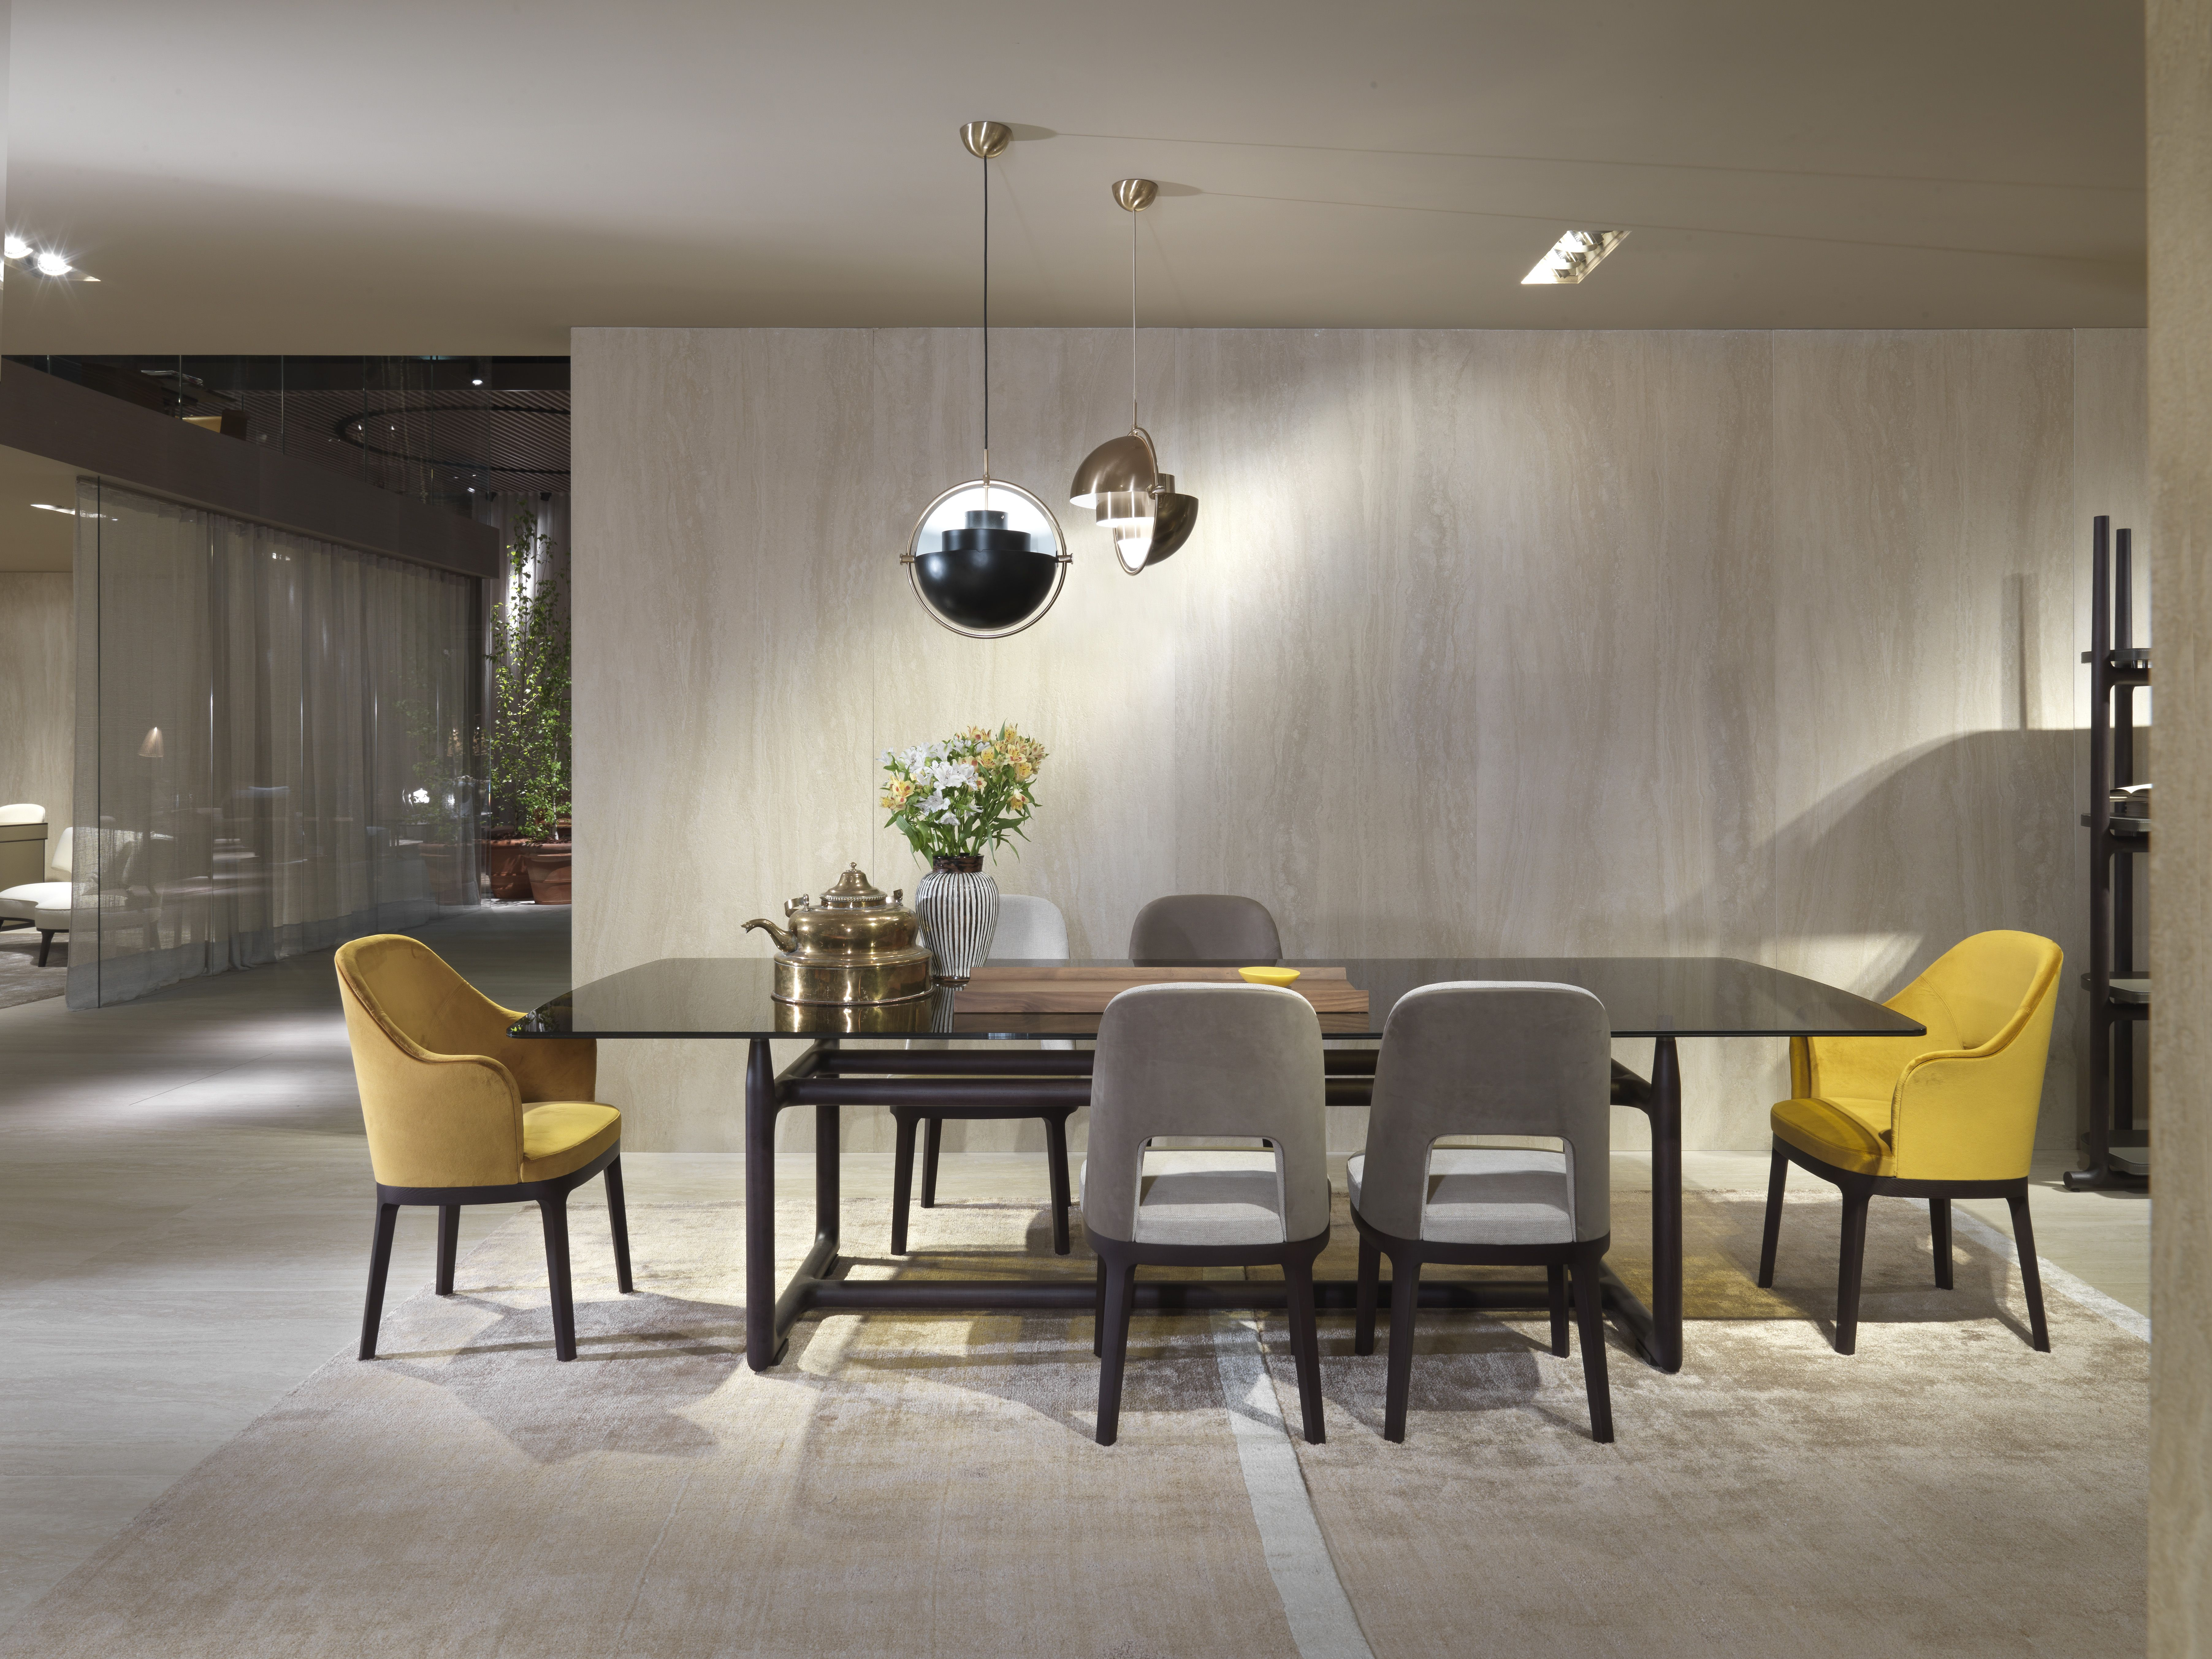 Orange 8  Ando Studio - Ambient  Dining Room